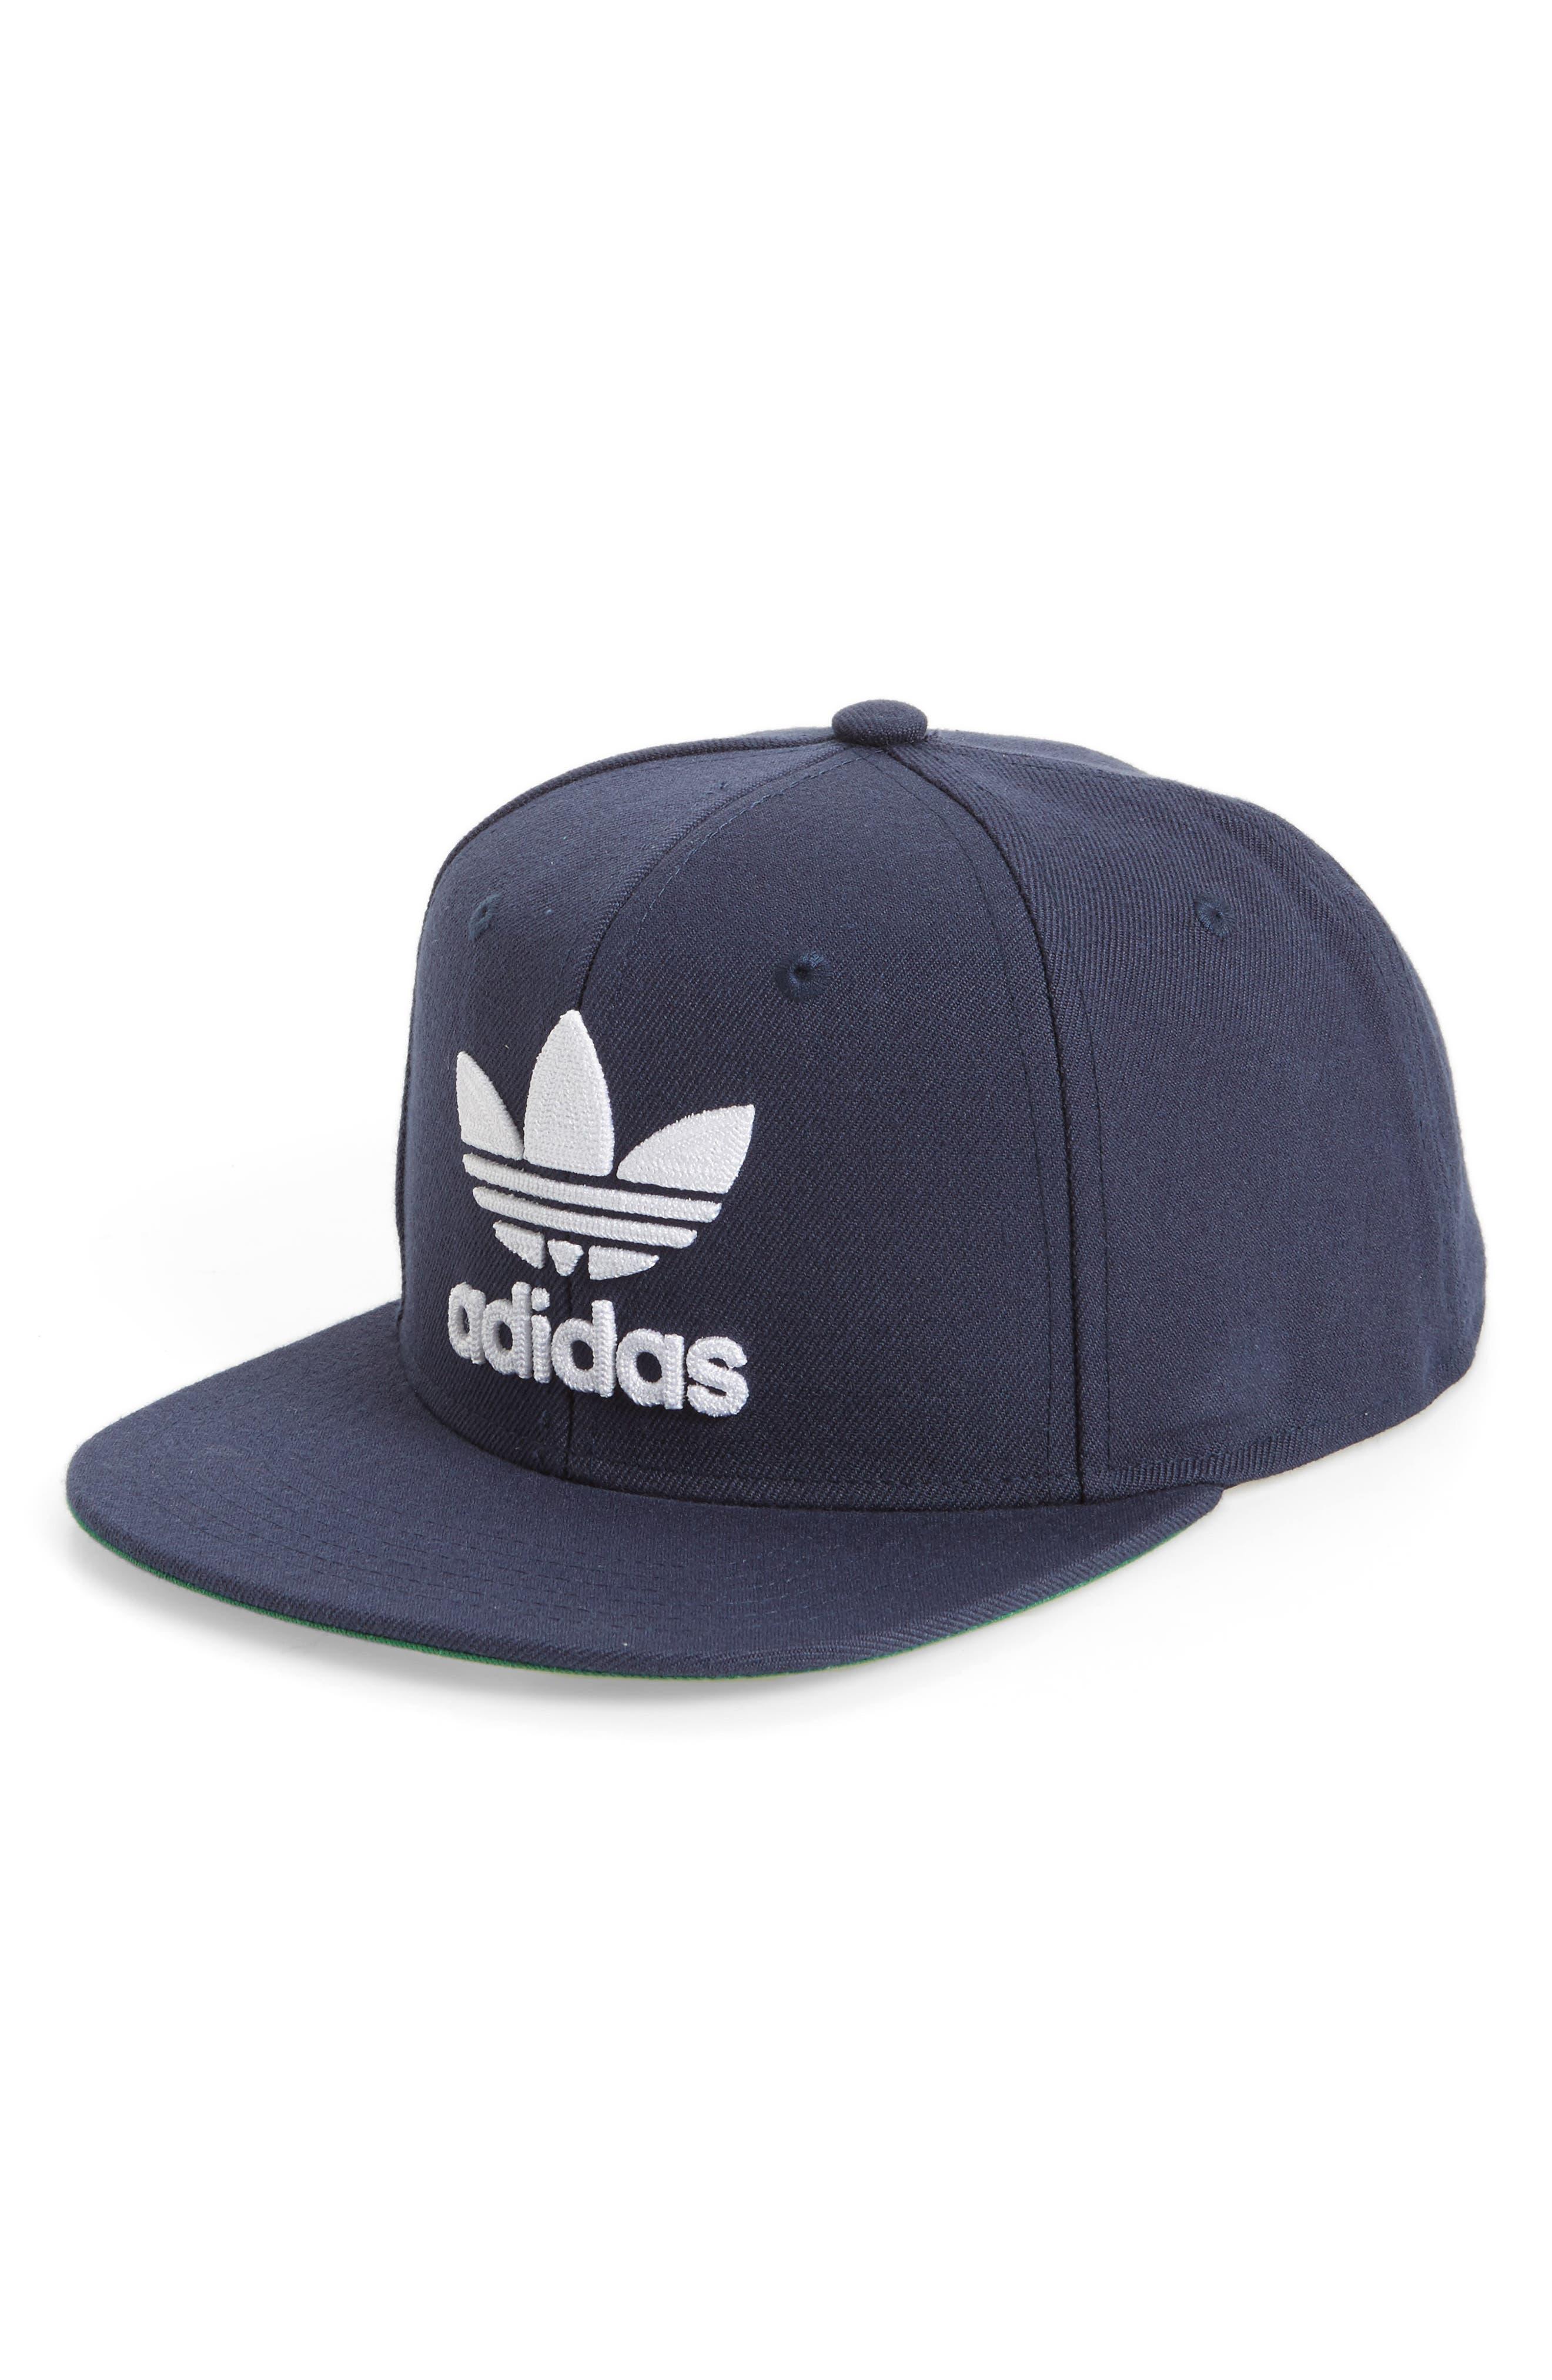 adidas Trefoil Chain Snapback Baseball Cap,                         Main,                         color, Dark Blue